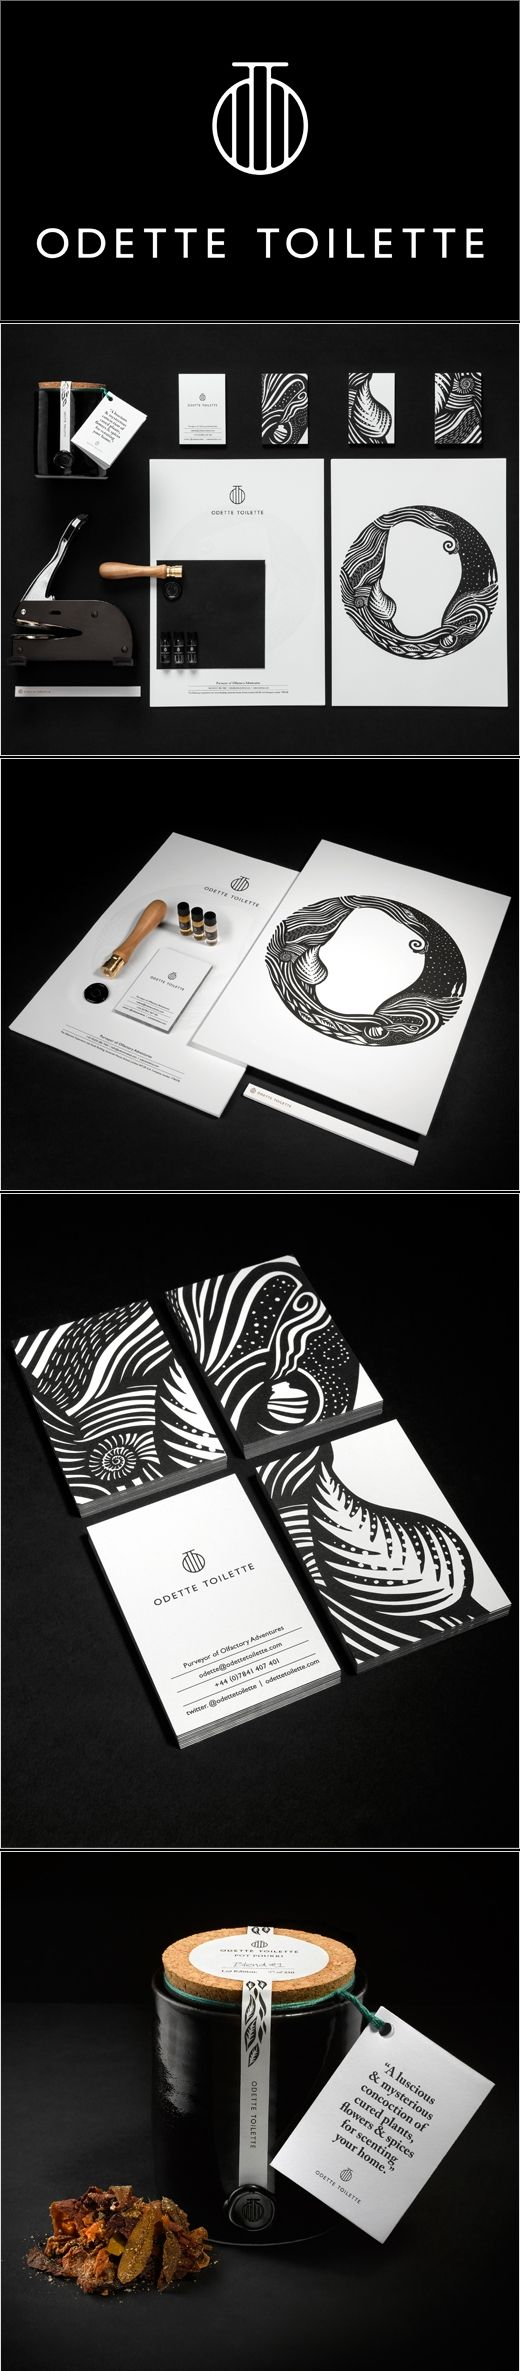 Odette Toilette I'm a sucker for black and white #identity #packaging #branding PD